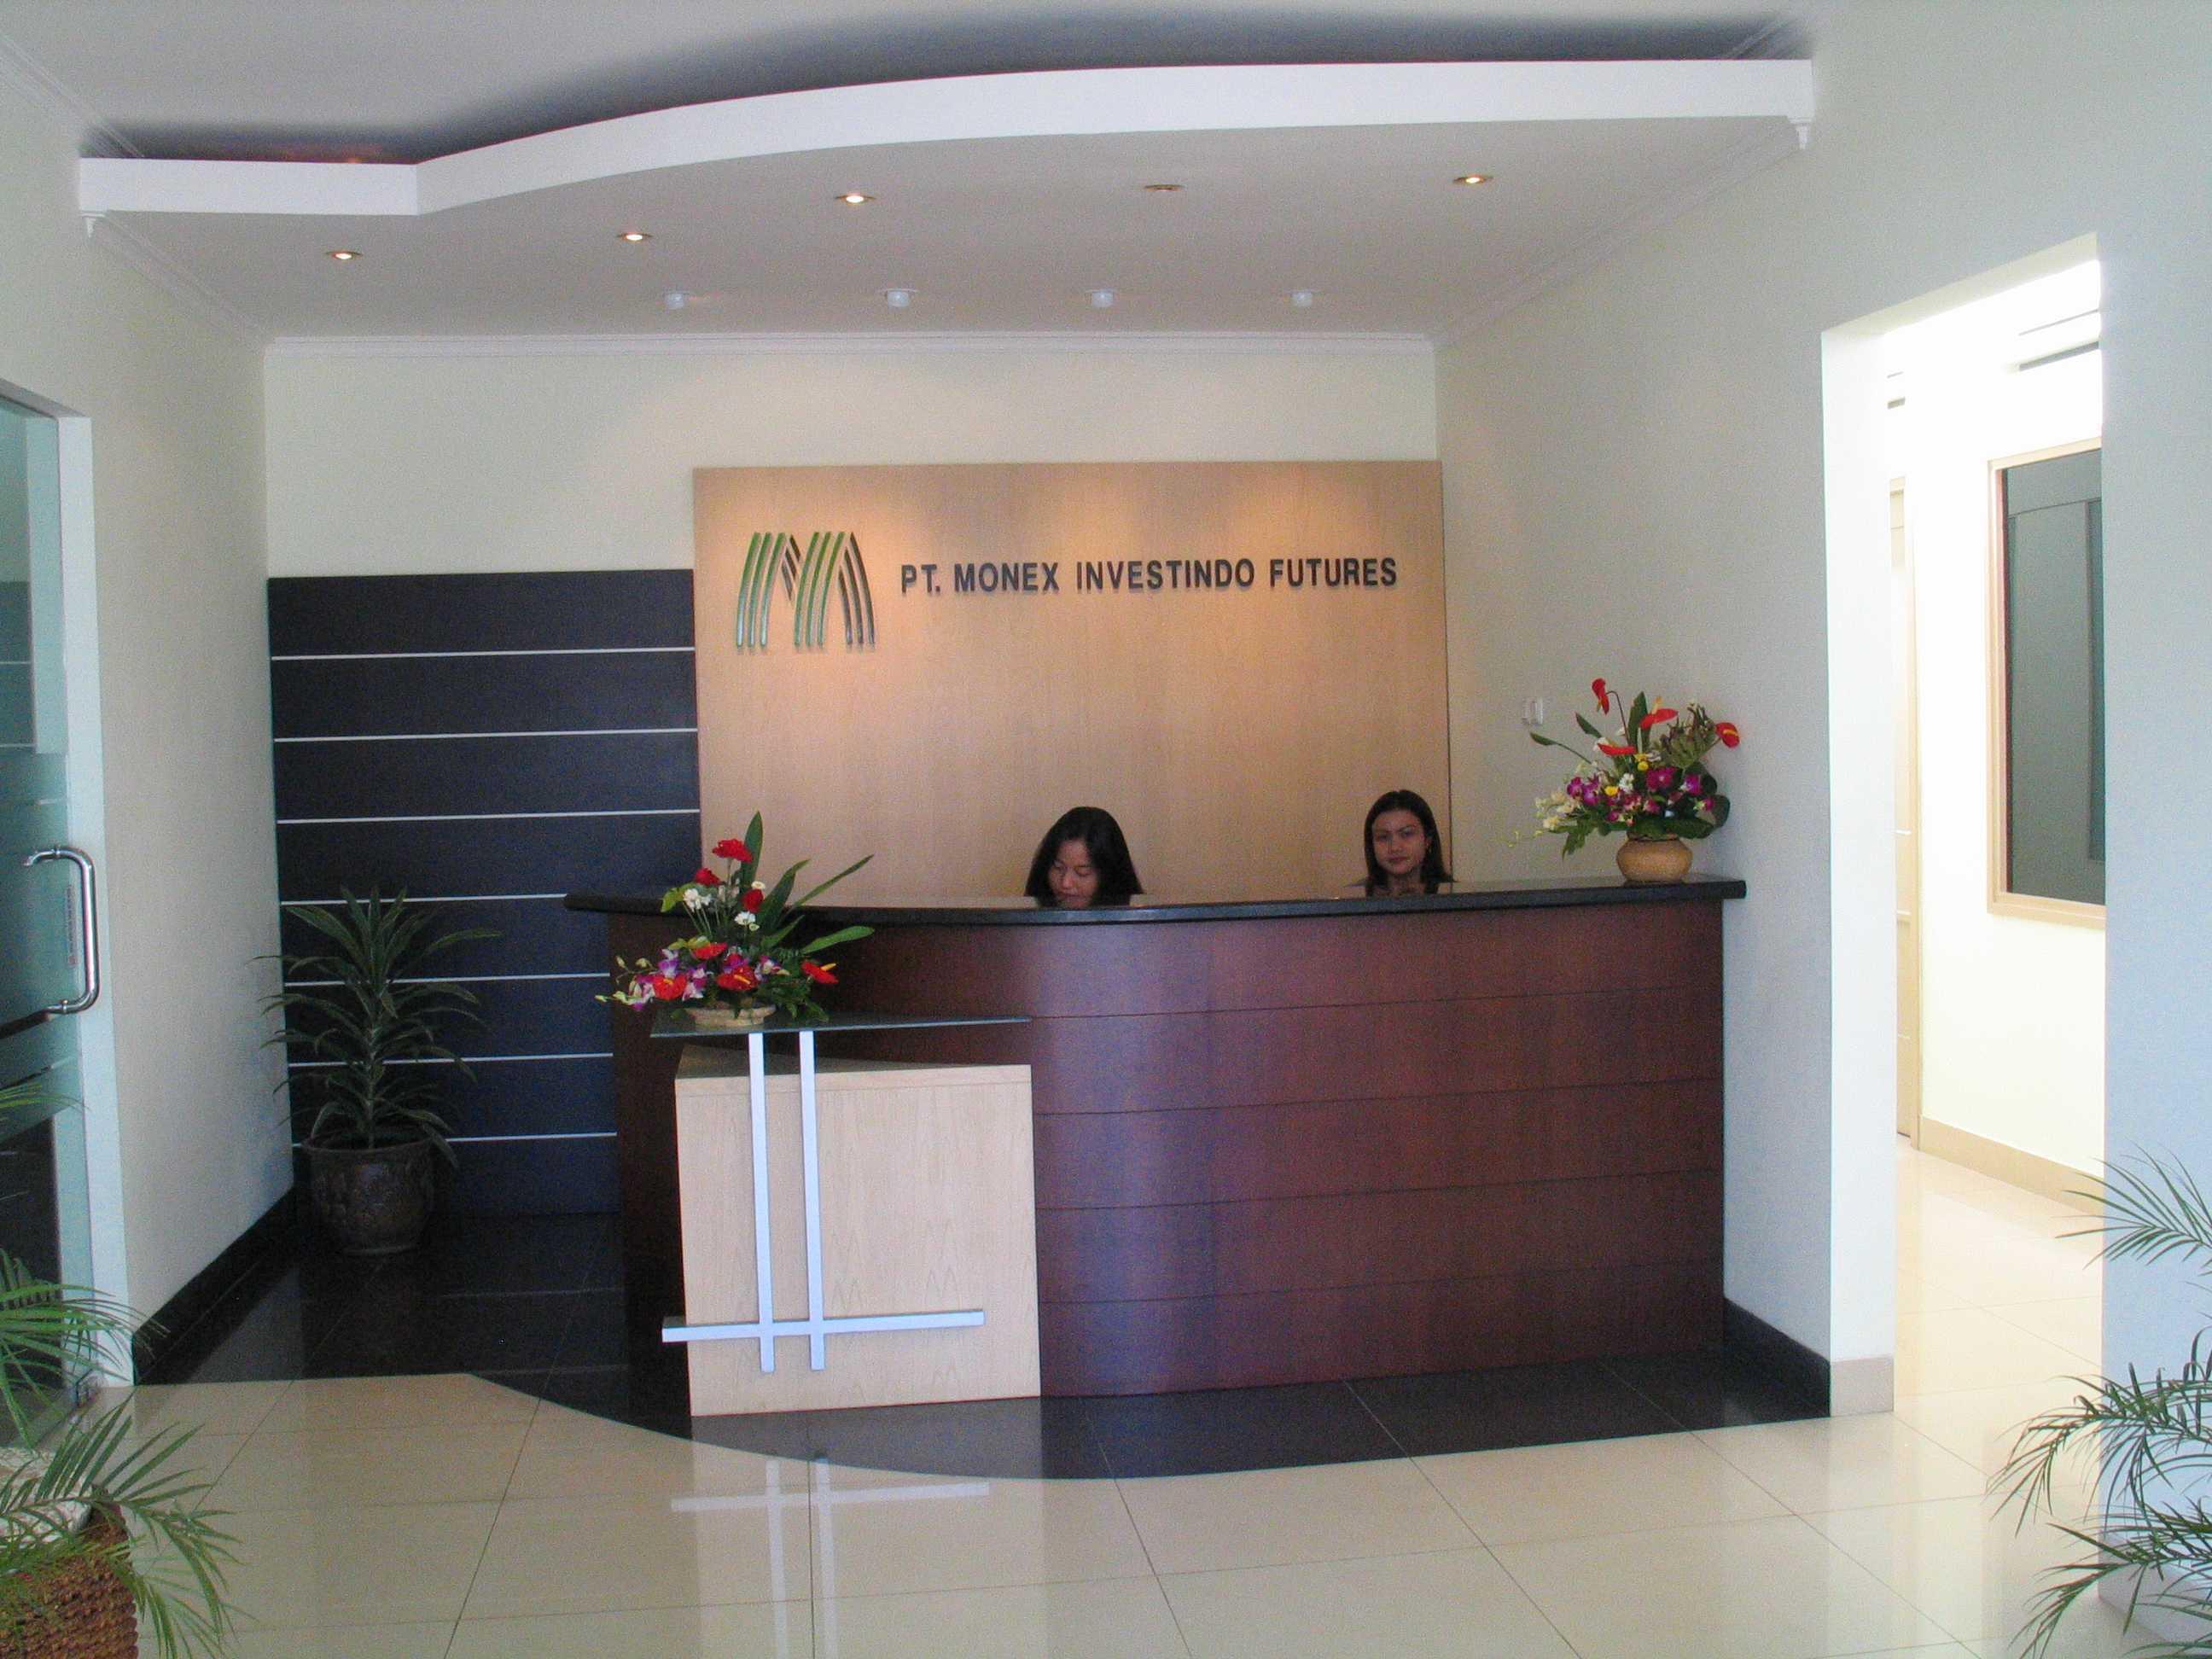 Nextarchitect Renovasi Kantor Monex Investindo Futures Bandung, Kota Bandung, Jawa Barat, Indonesia Bandung, Kota Bandung, Jawa Barat, Indonesia Monex-Final-69   41771